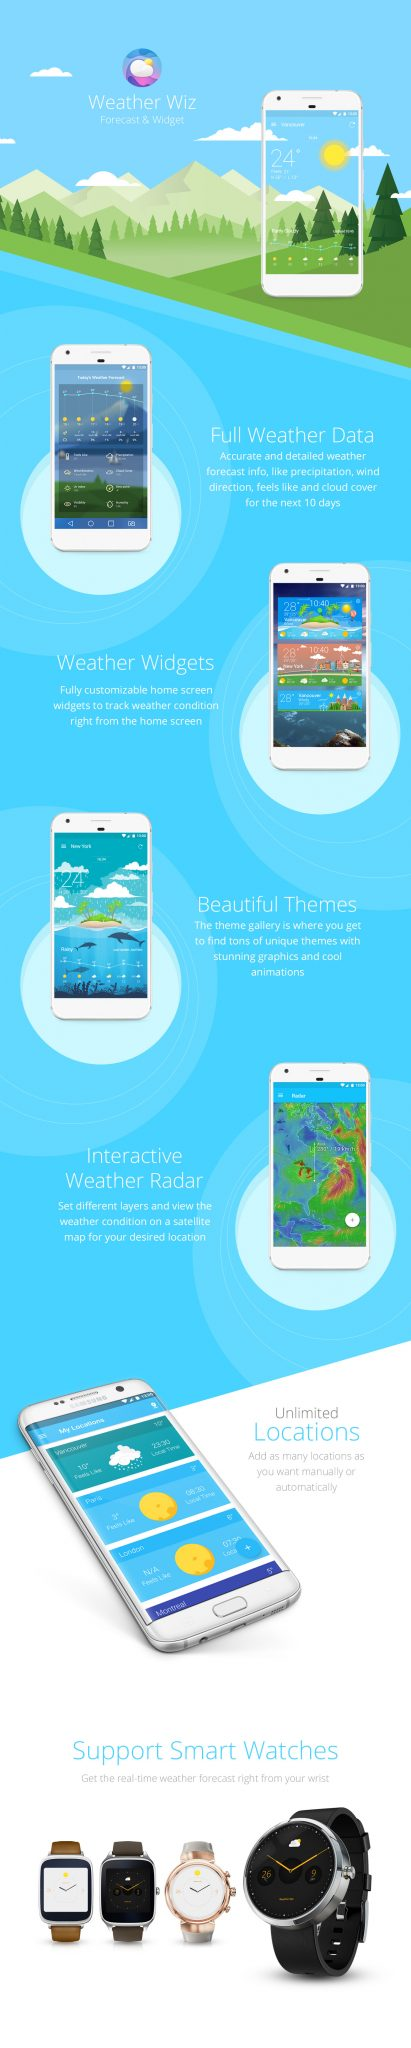 Weather Wiz Mobile App UI Design